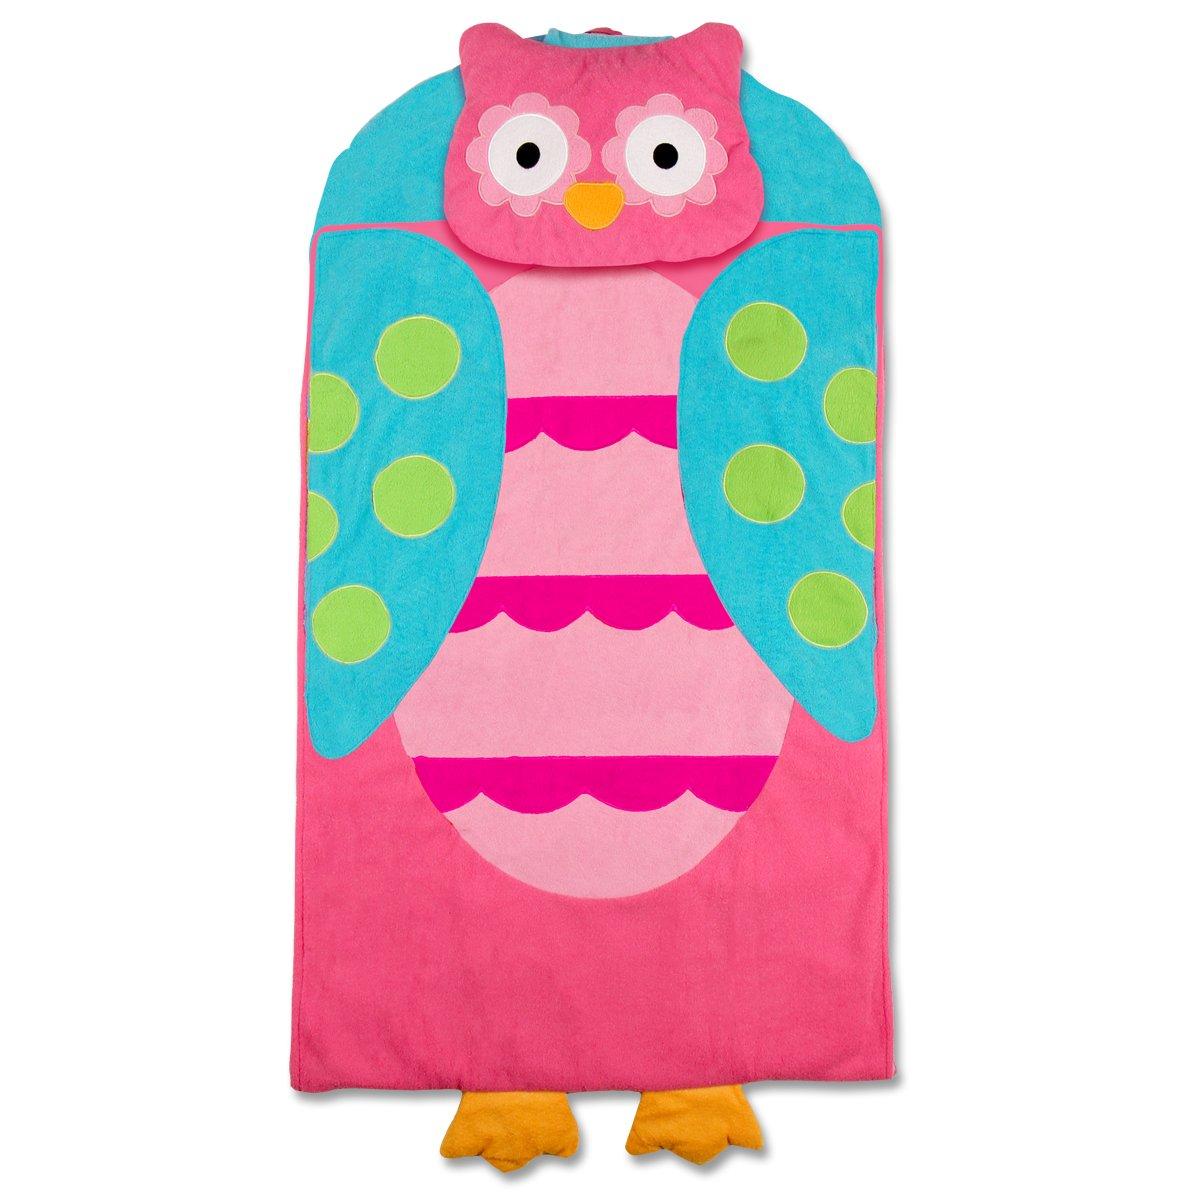 Stephen Joseph Owl Nap Mat, Pink/Turquoise SJ770176A